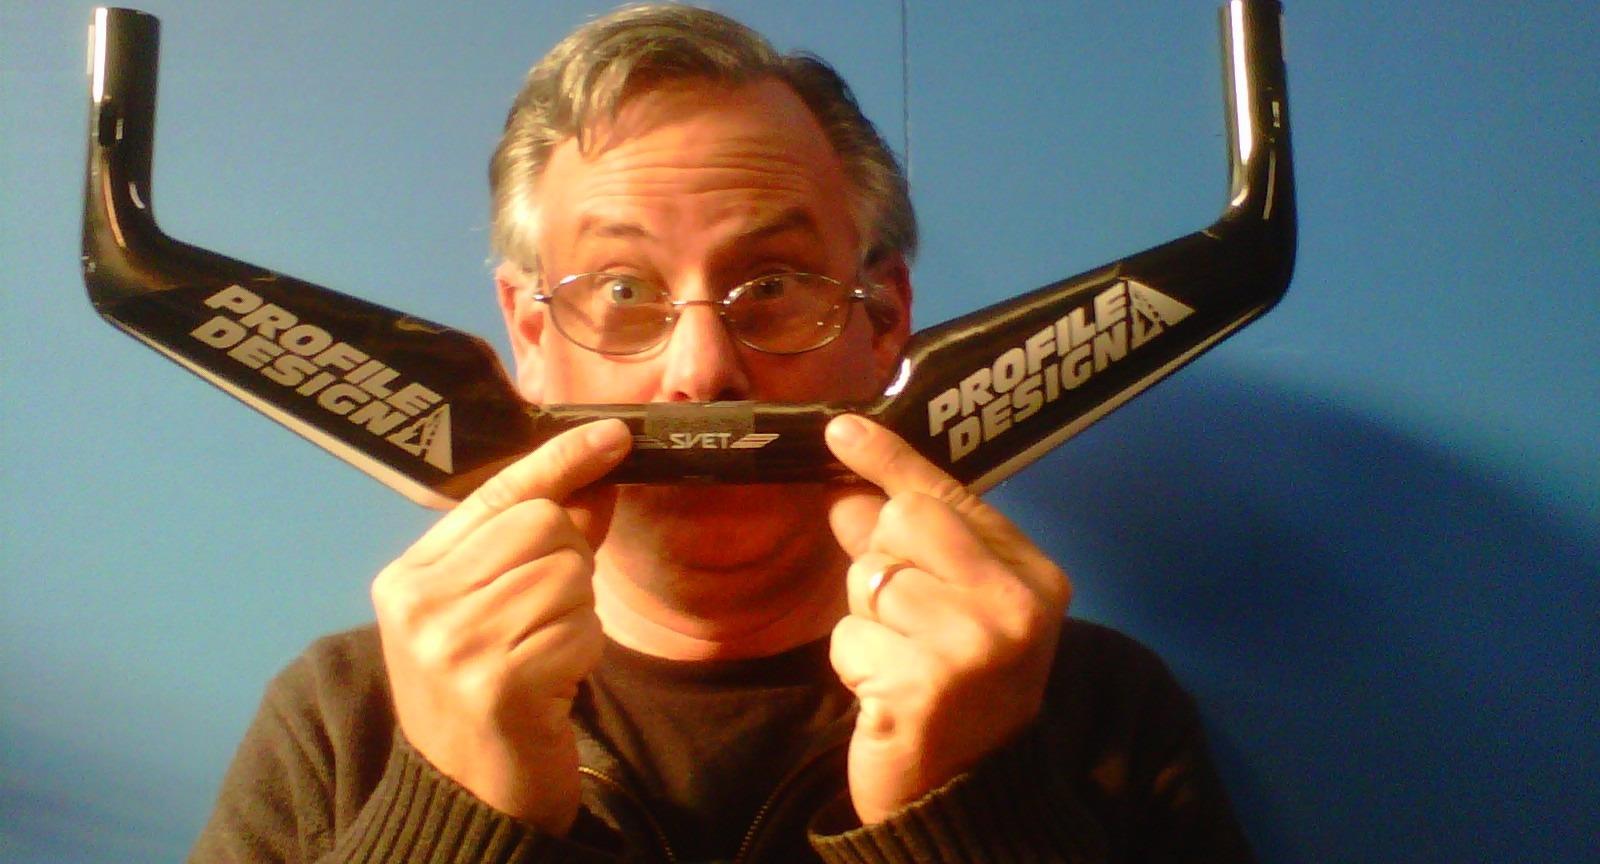 Philip Casanta being goofy using a bike handlebar as a mustache